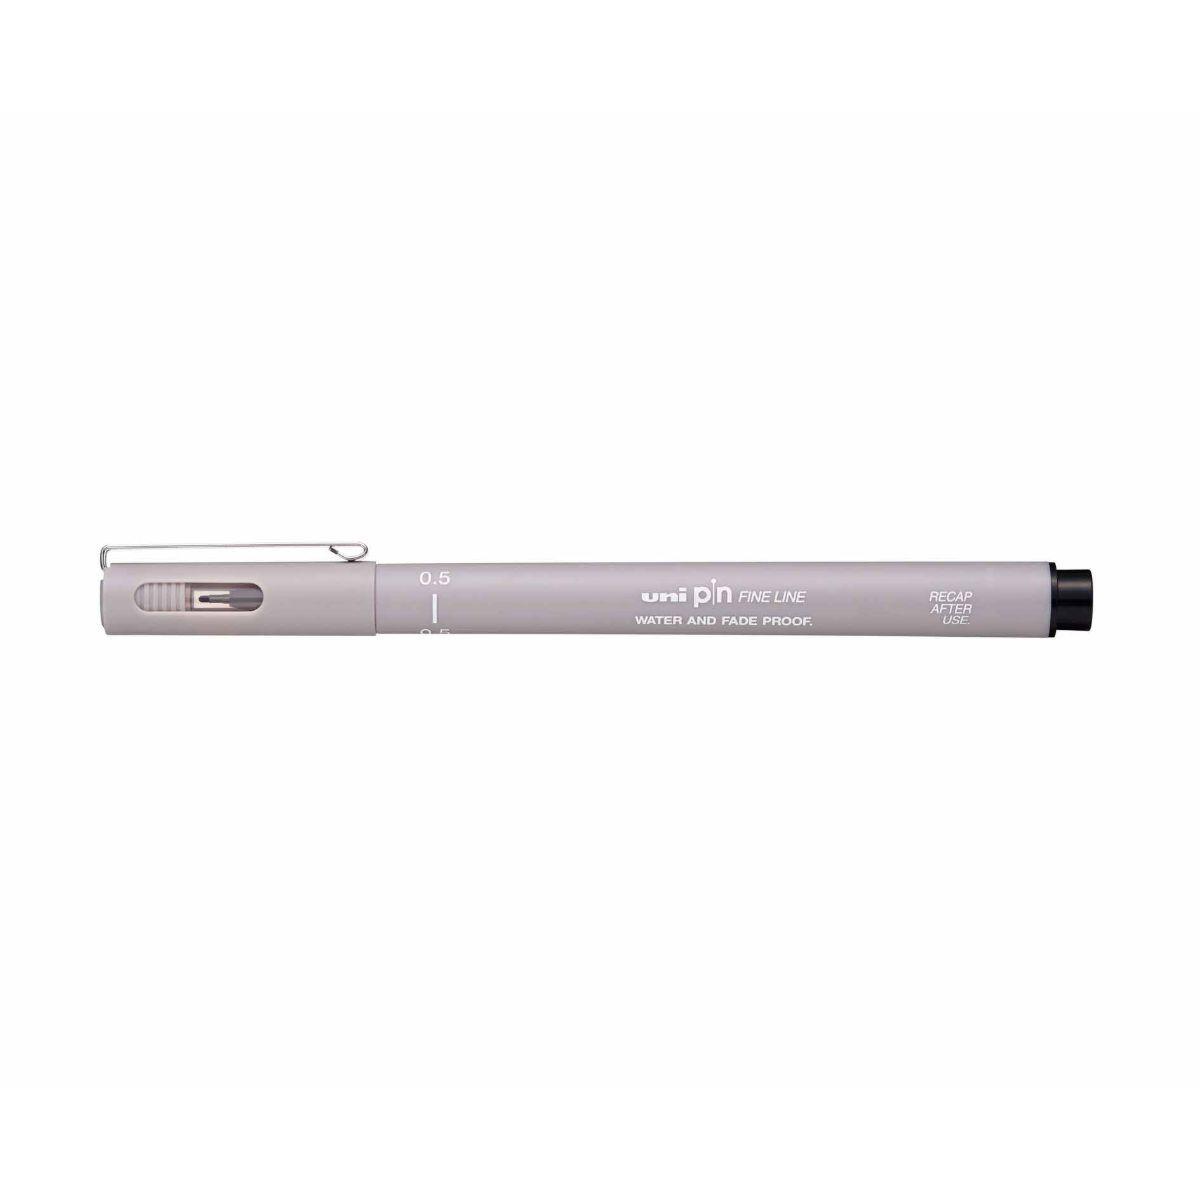 uni-ball Drawing Pen PIN 200 0.5 Loose Light Grey